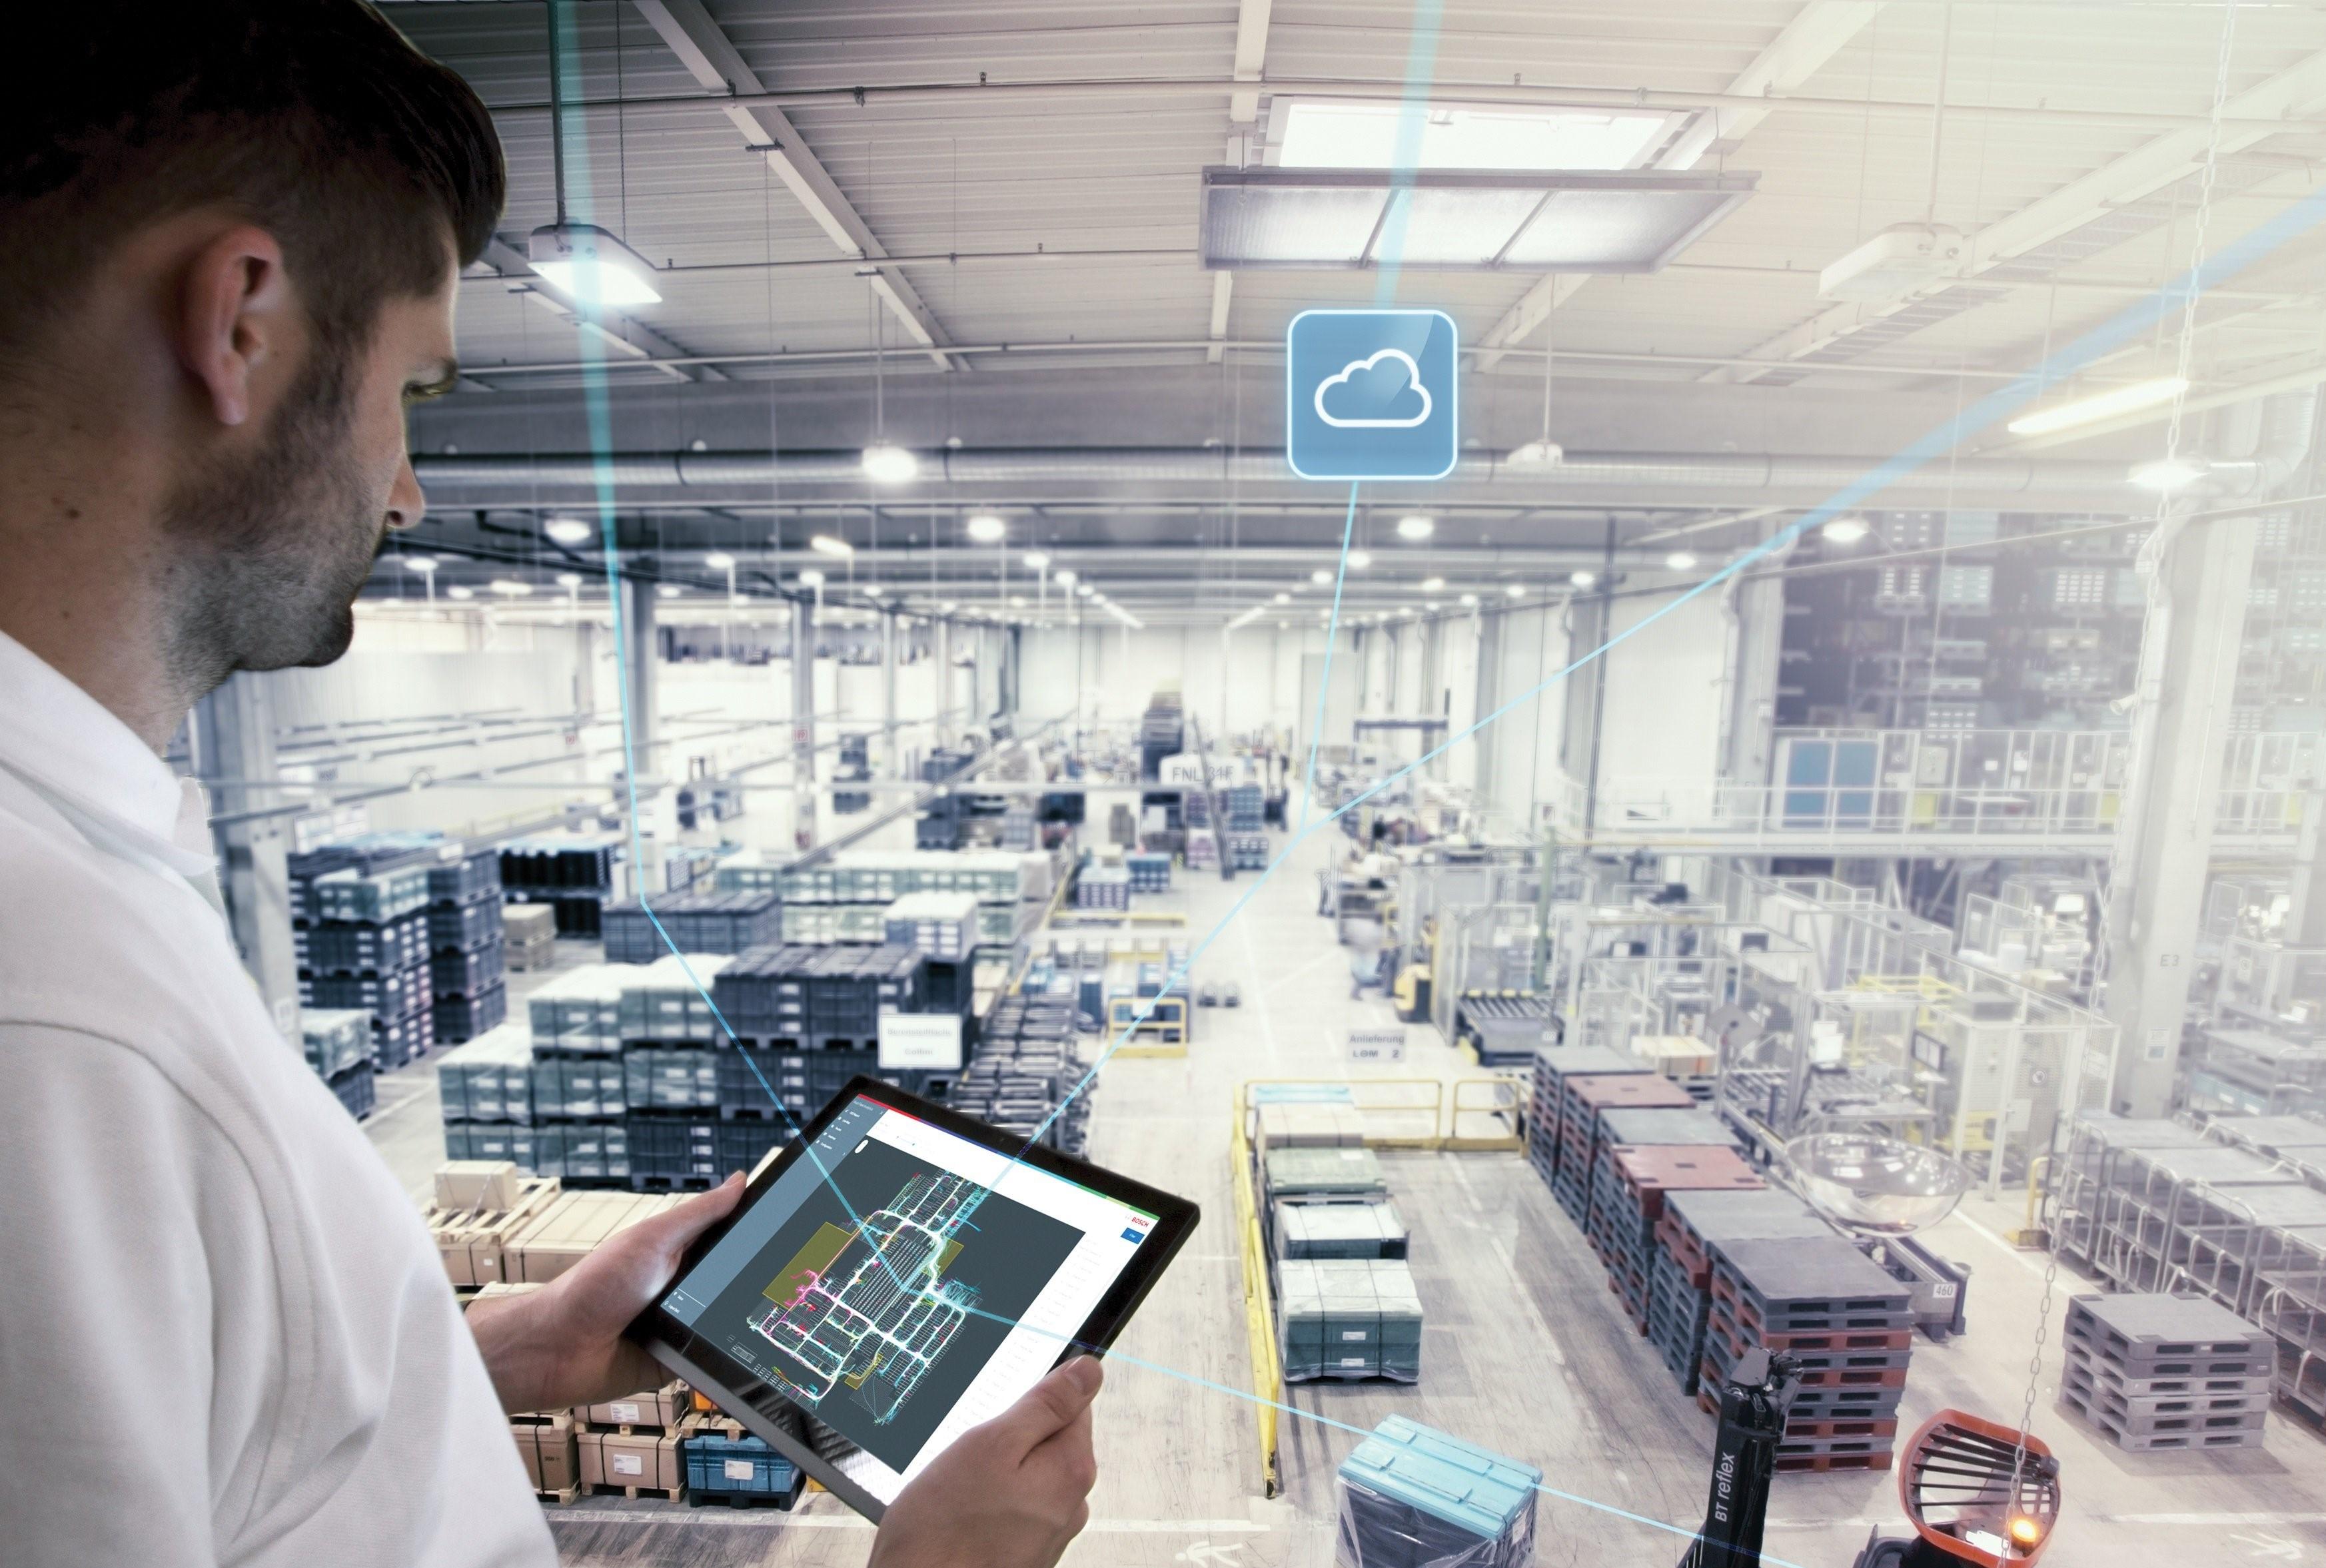 Sistema de aplicação industrial Nexeed da Bosch Connected Industry